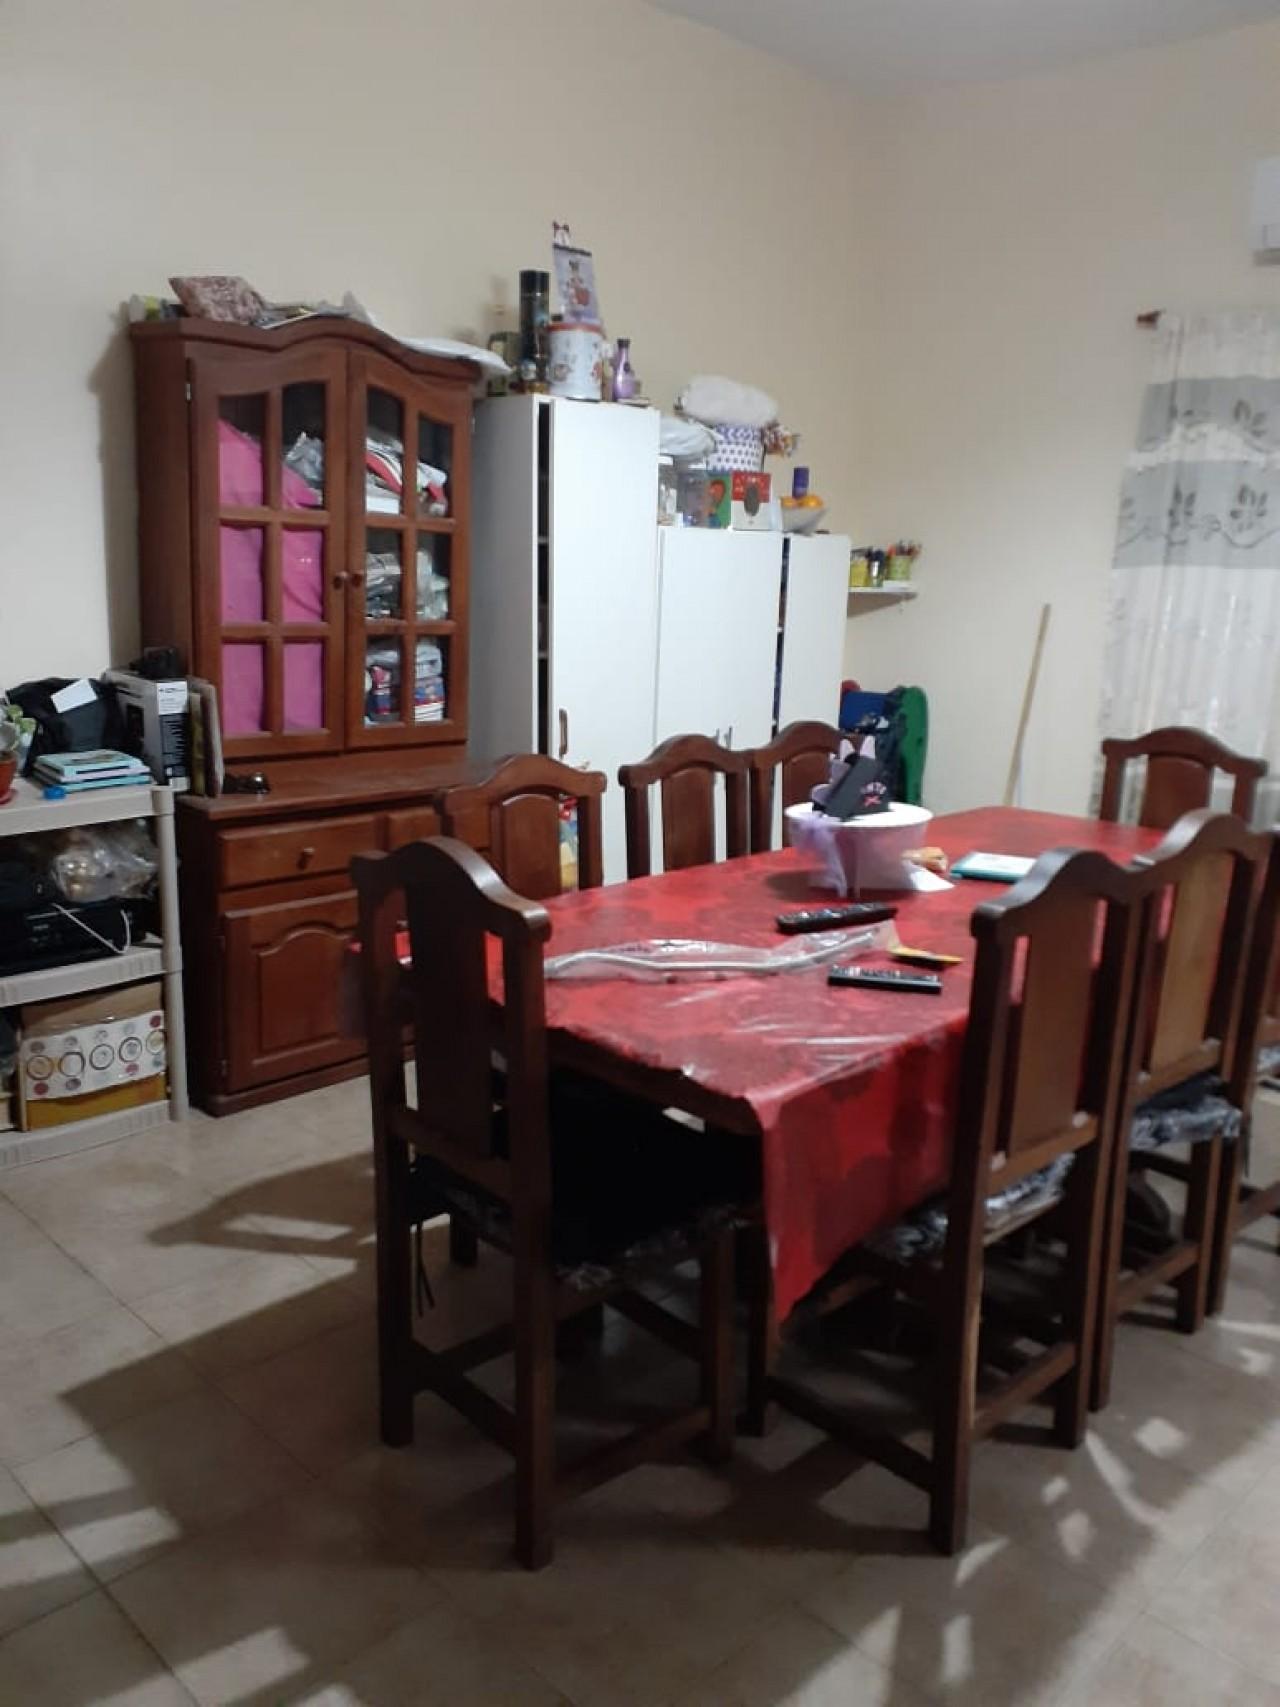 CASA MULTI FAMILIAR - SON 4 PH EN BLOCK (VILLA MAIPU-SAN MARTIN)